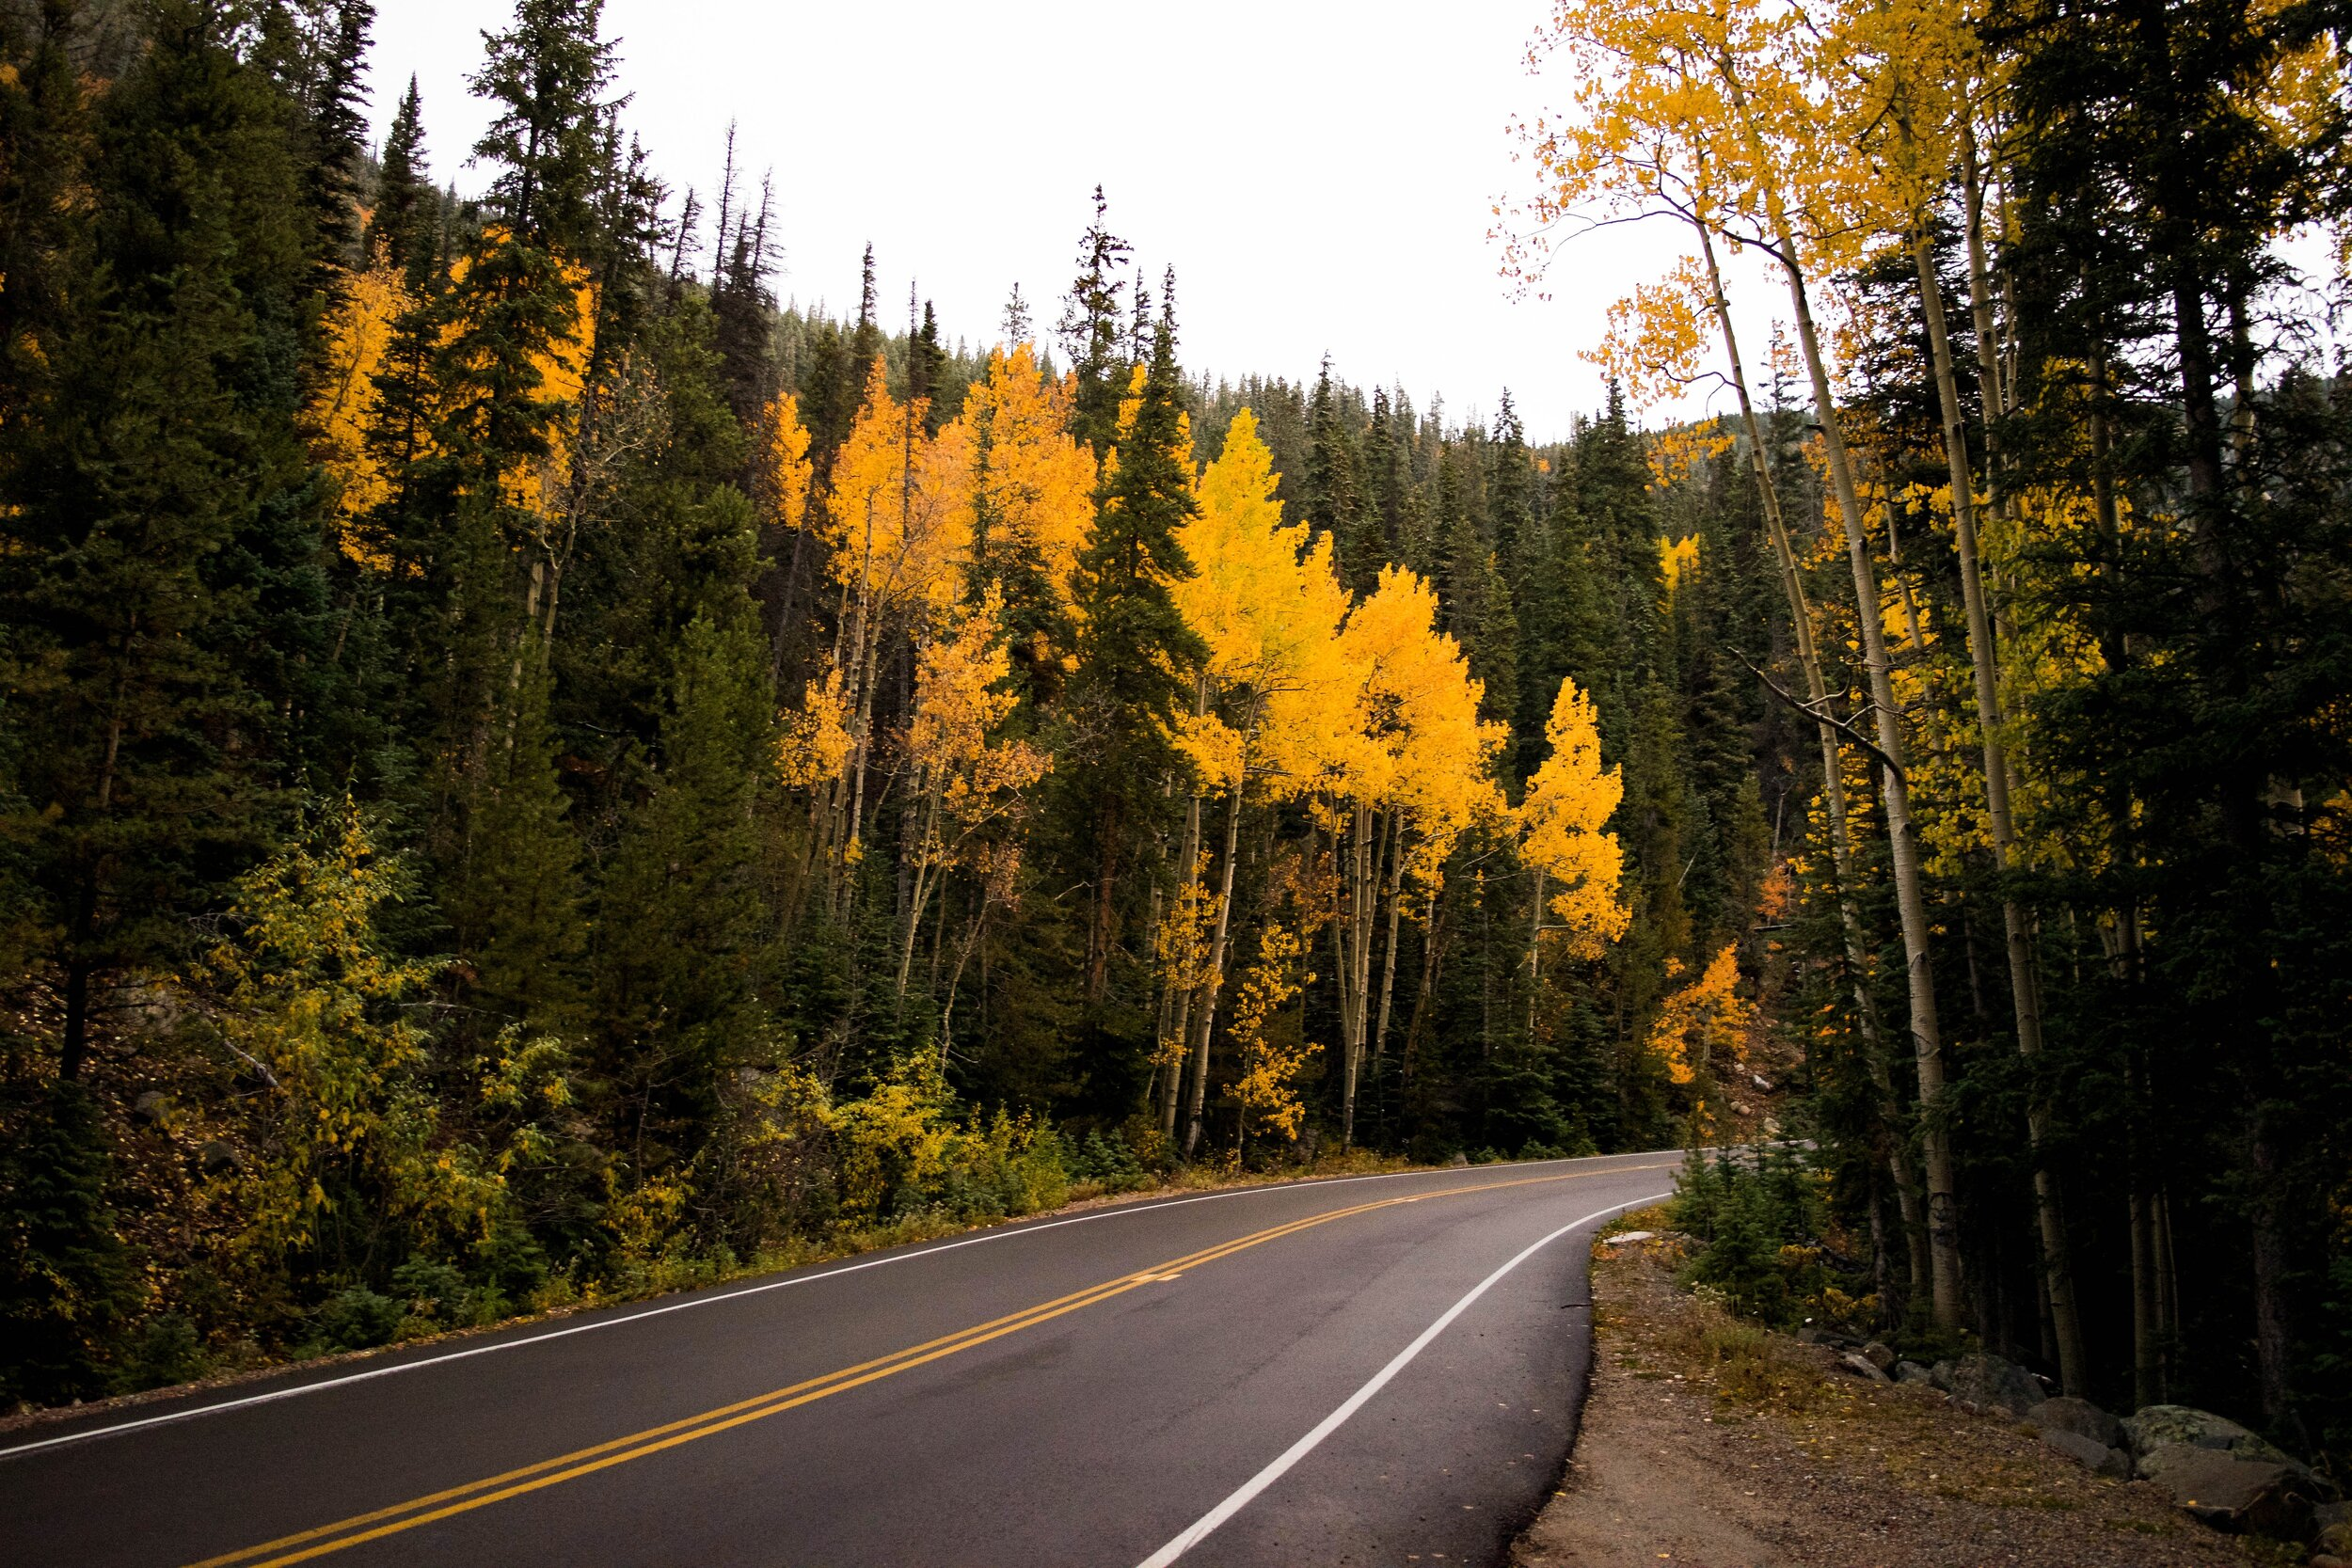 clear-sky-conifers-curvy-road-197900.jpg